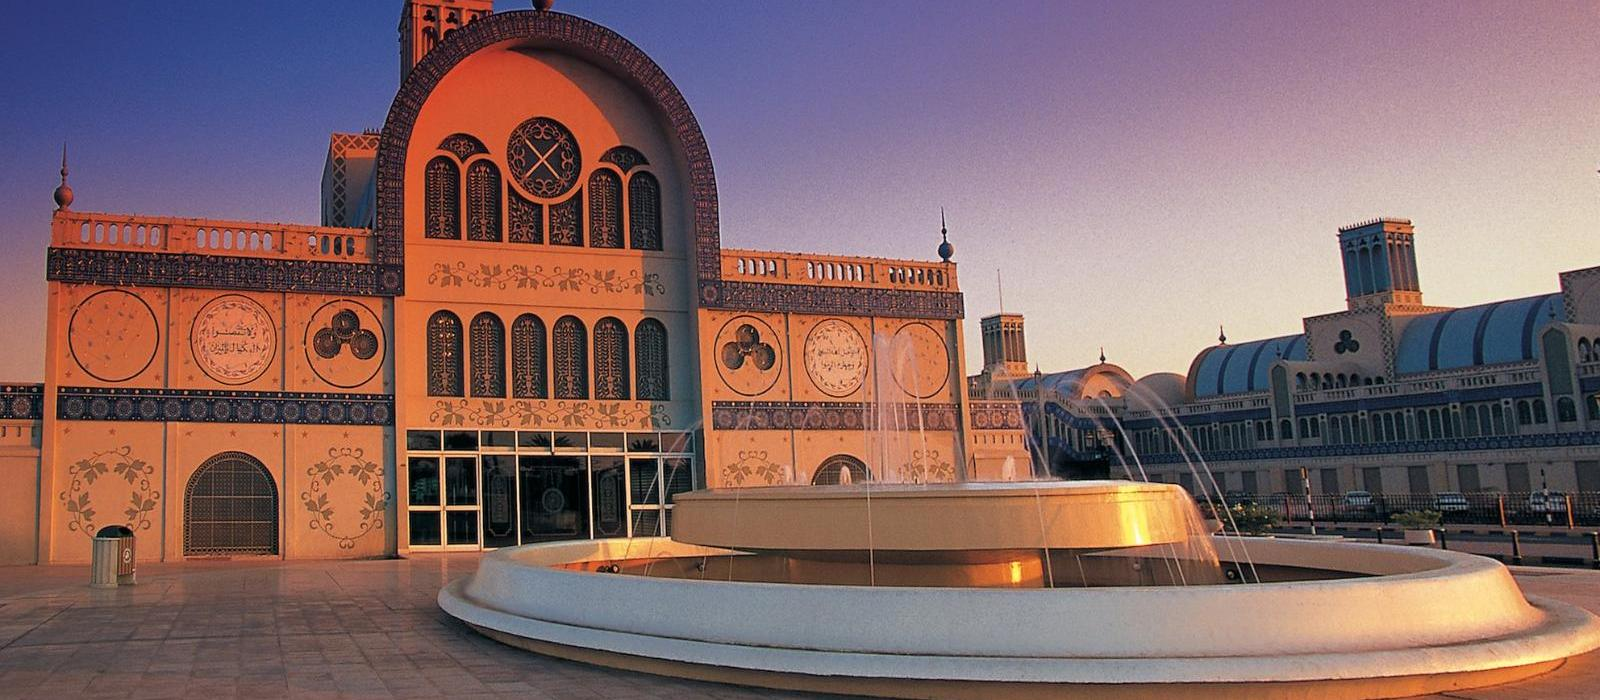 沙迦艺博度假酒店(Al Bait Sharjah, UAE) 图片  www.lhw.cn